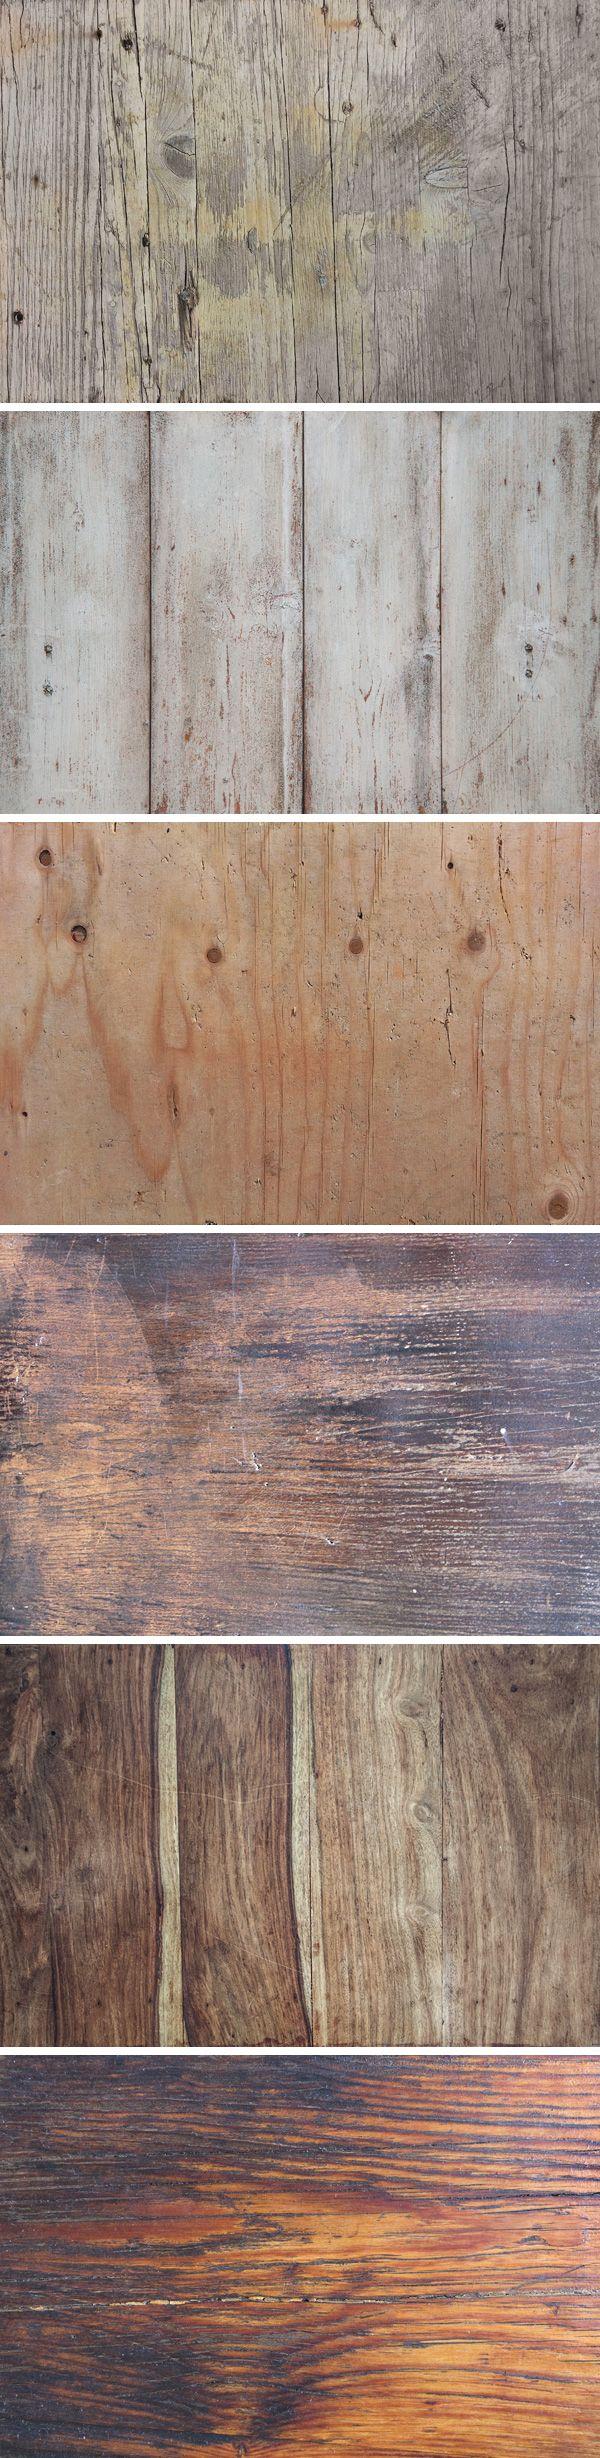 6 Vintage Wood Textures Vol.3 | GraphicBurger